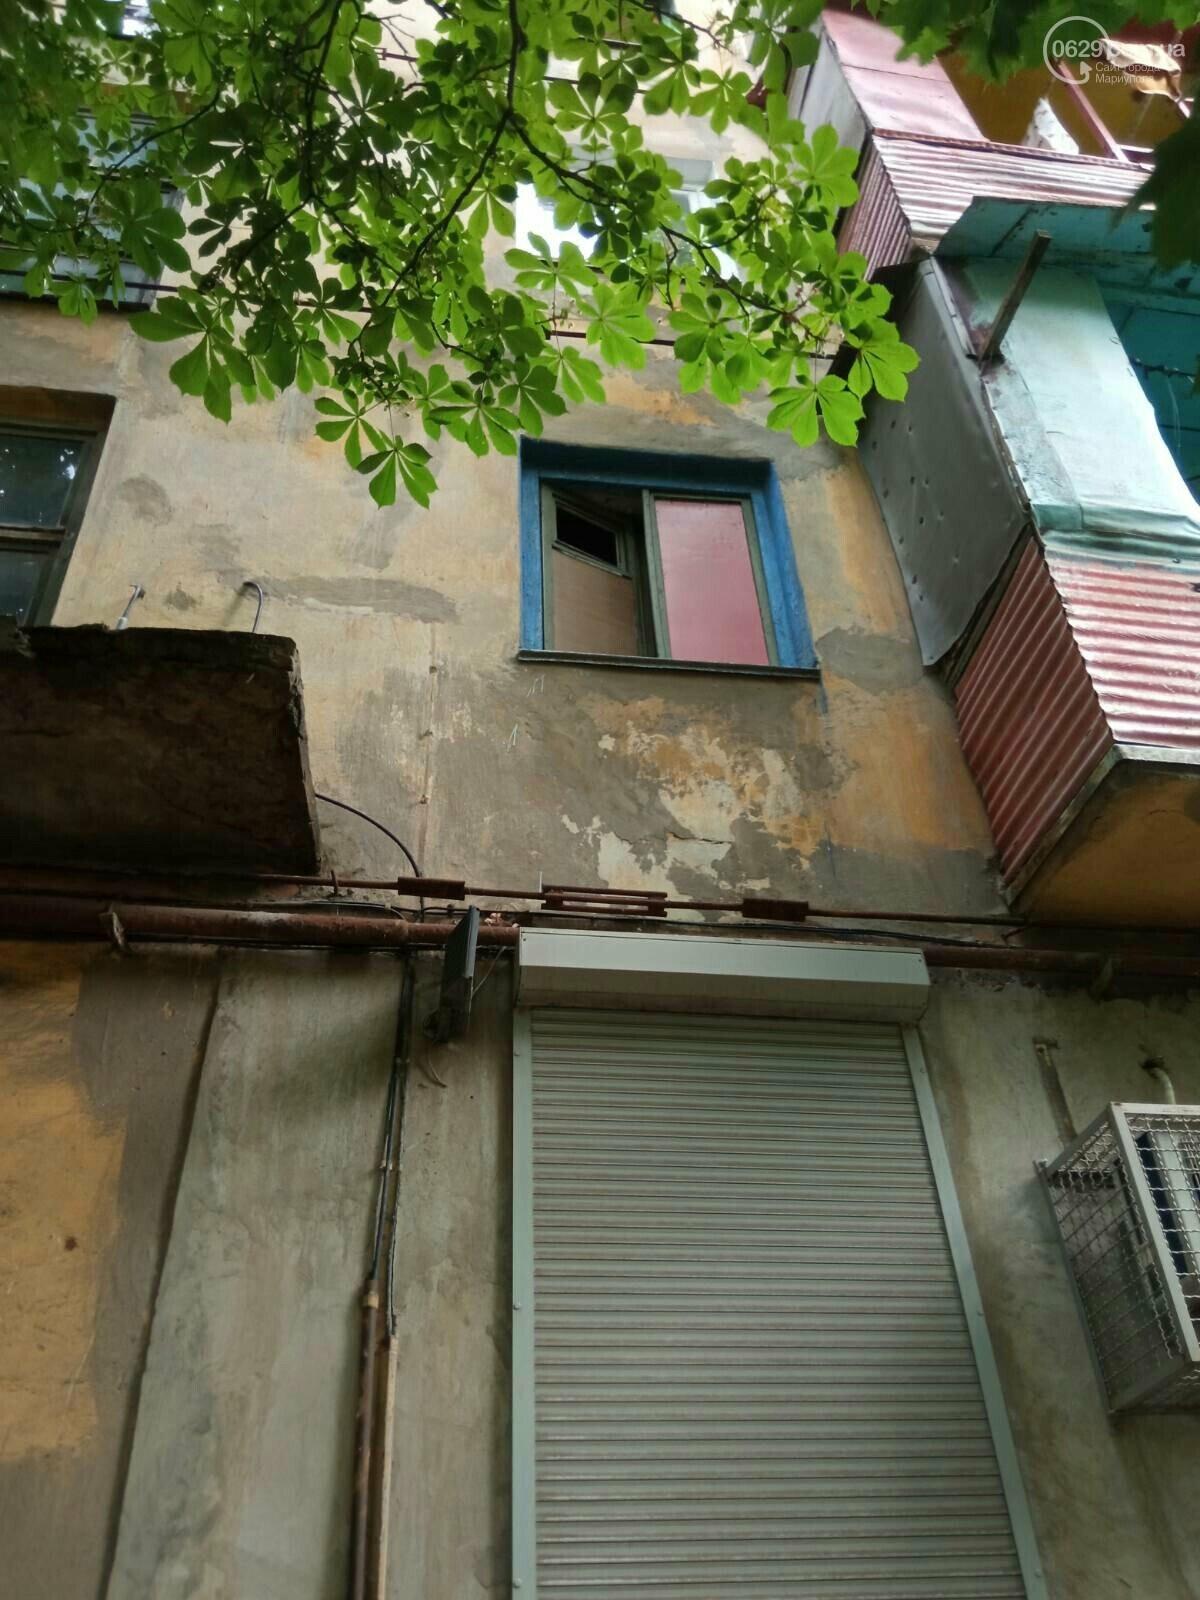 Соседи в ужасе! Бомжи и наркоманы захватили пустующую квартиру в Мариуполе и устроили притон, - ФОТО, фото-2